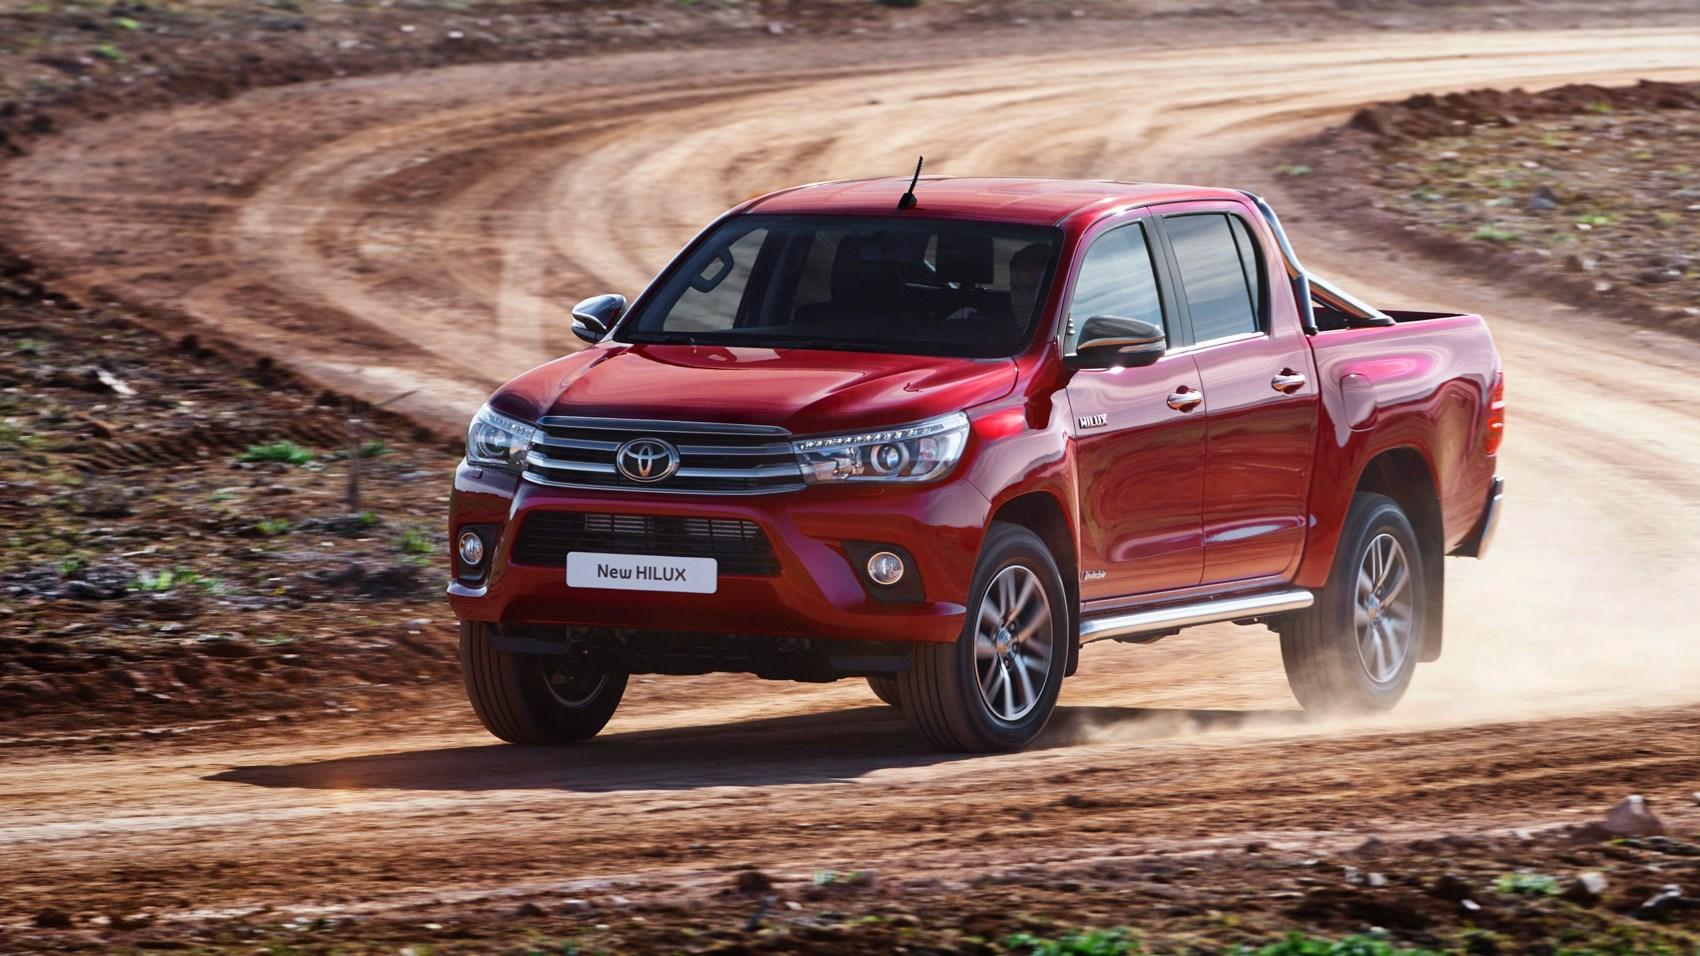 Toyota Hilux Backgrounds, Compatible - PC, Mobile, Gadgets| 1700x956 px